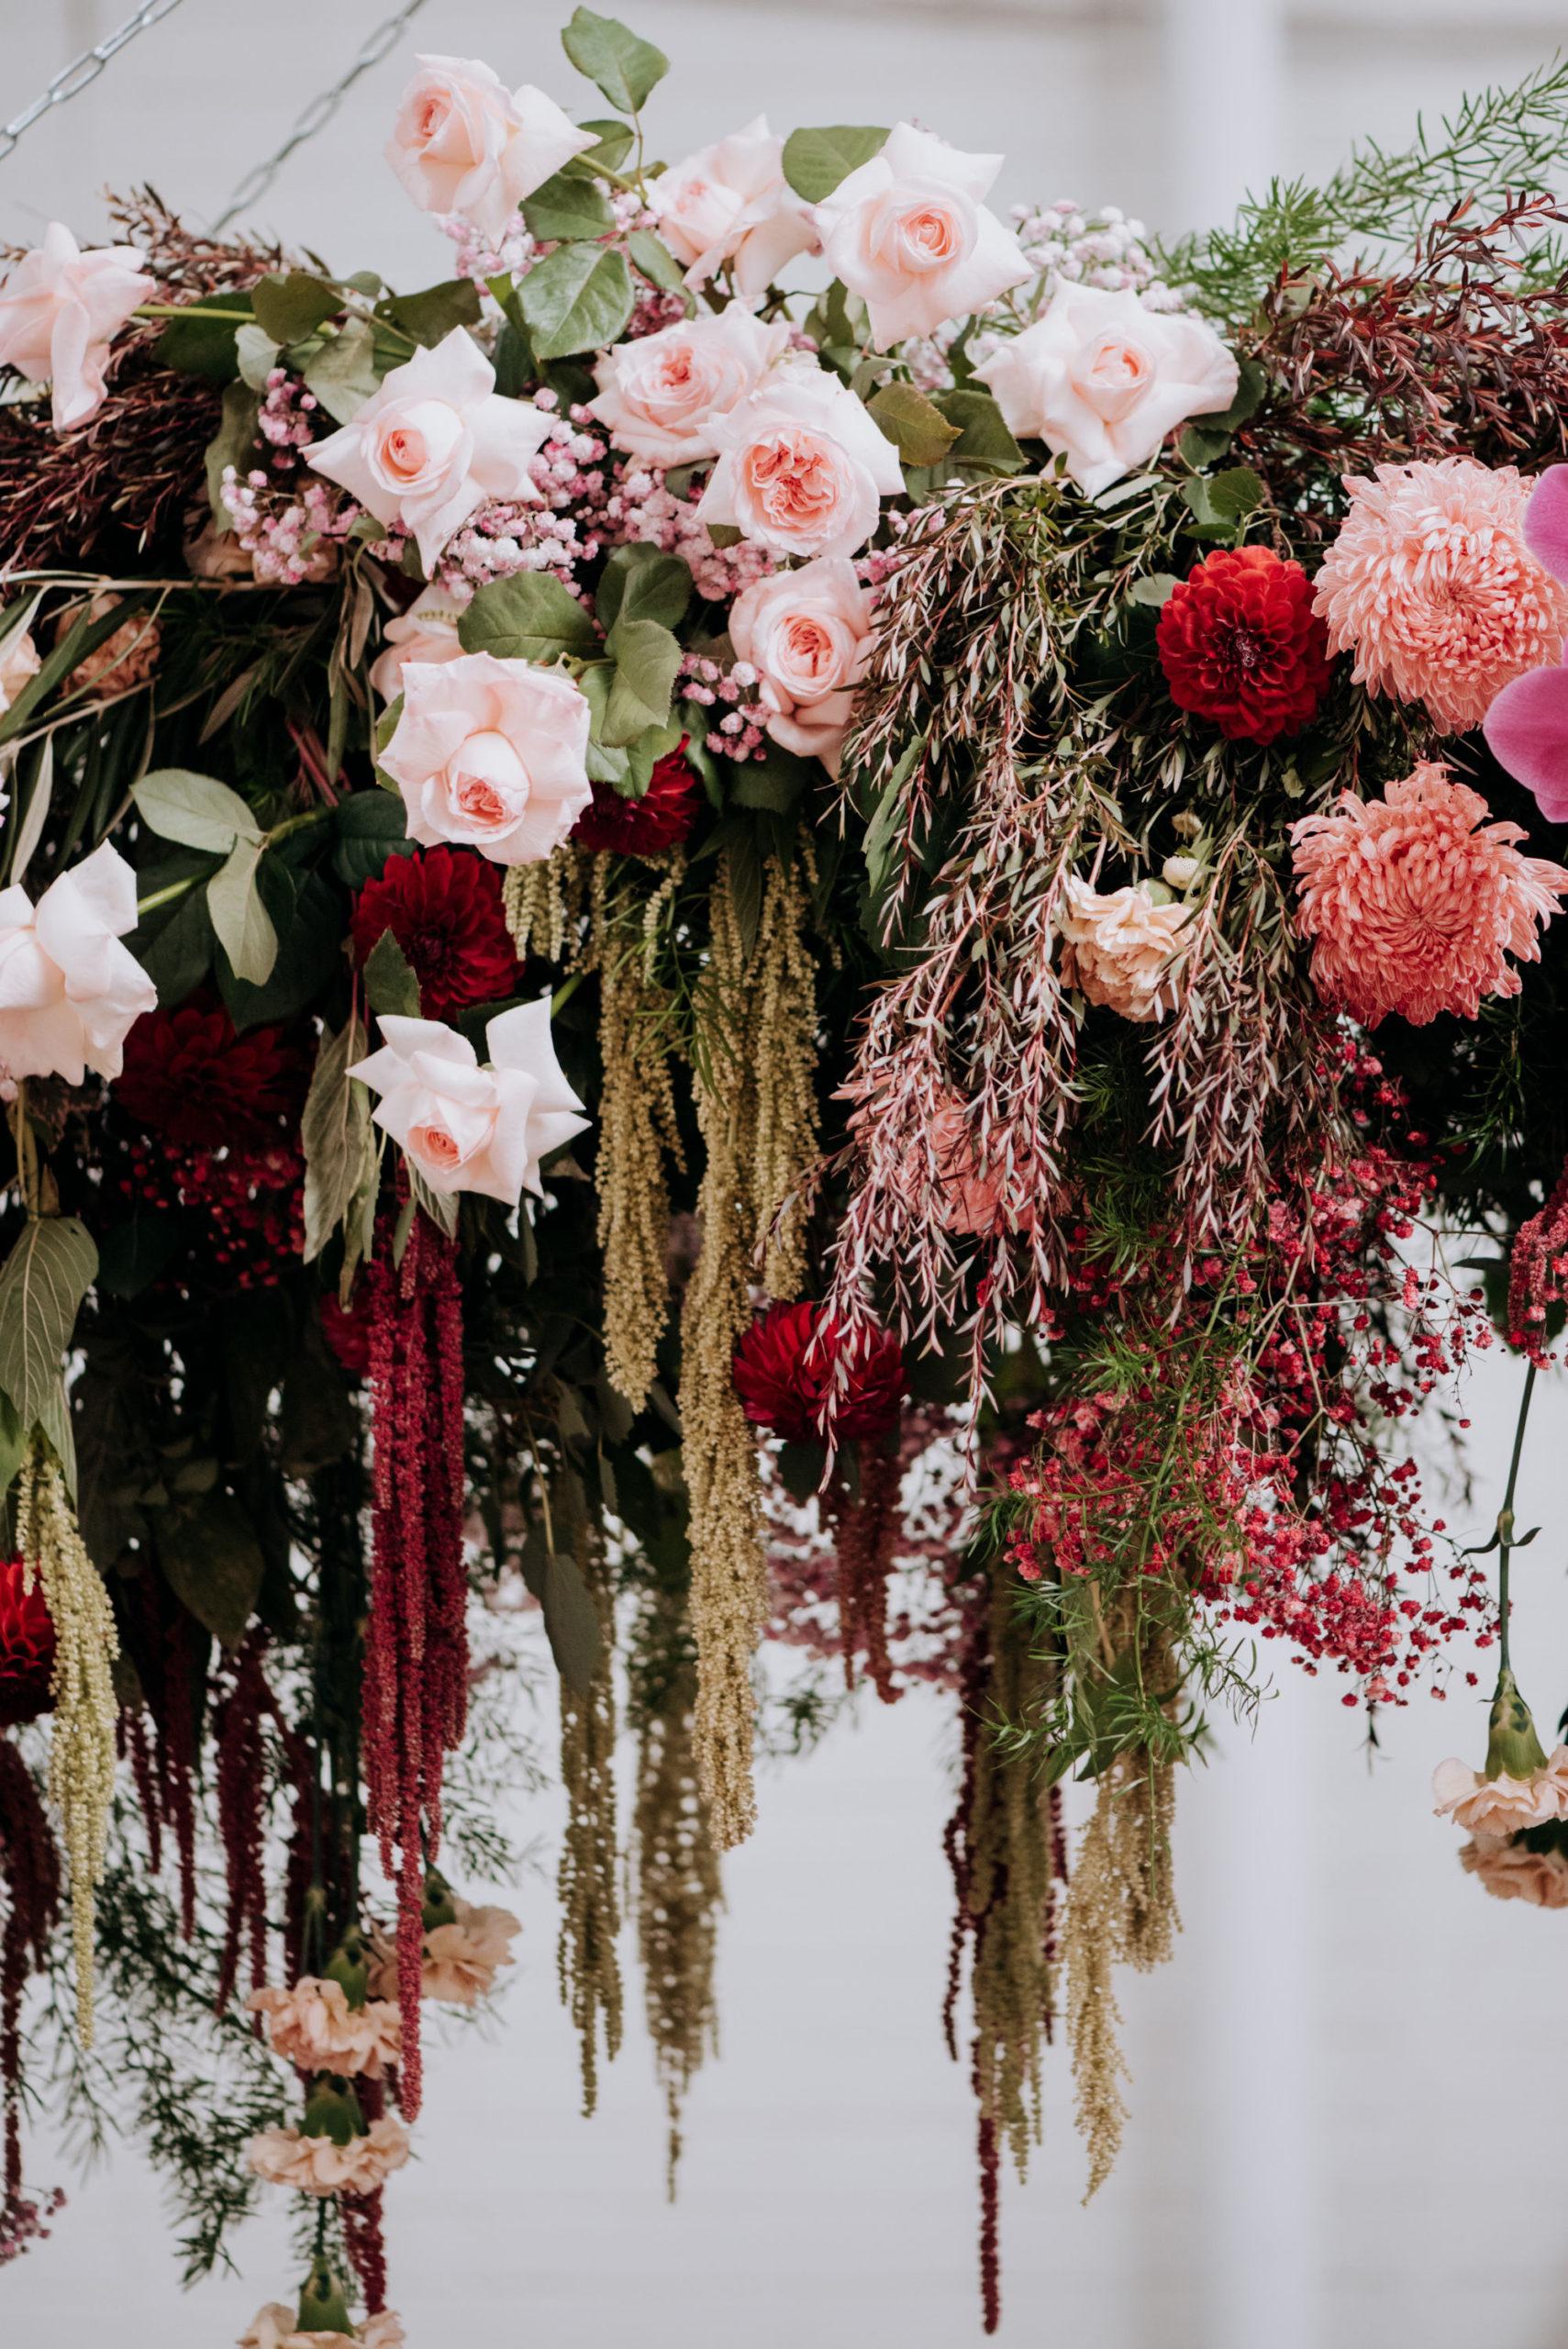 Melbourne Event Florist Hanging Suspended Flowers | Thrive Flowers & Events Melbourne